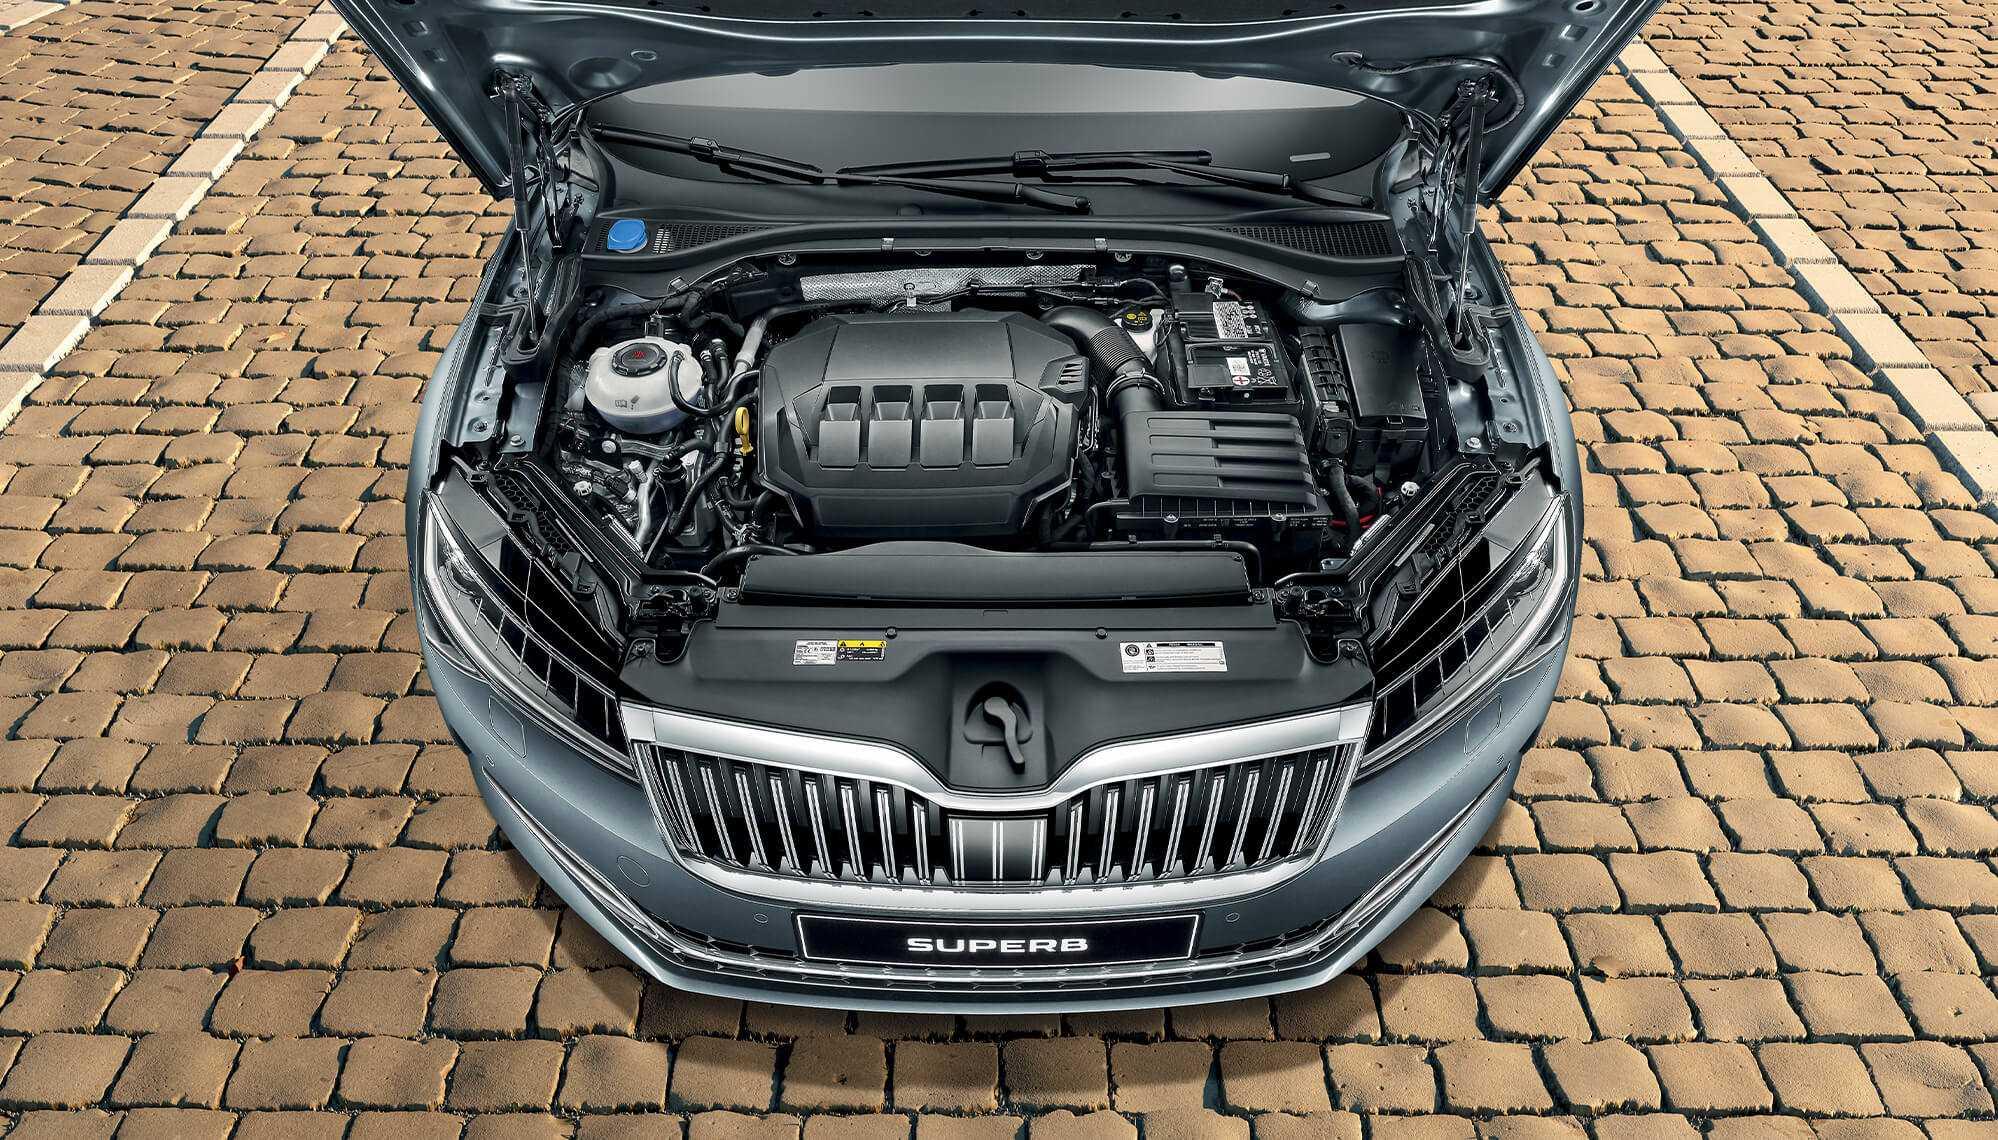 Двигатели mpi: особенности эксплуатации, фото, видео